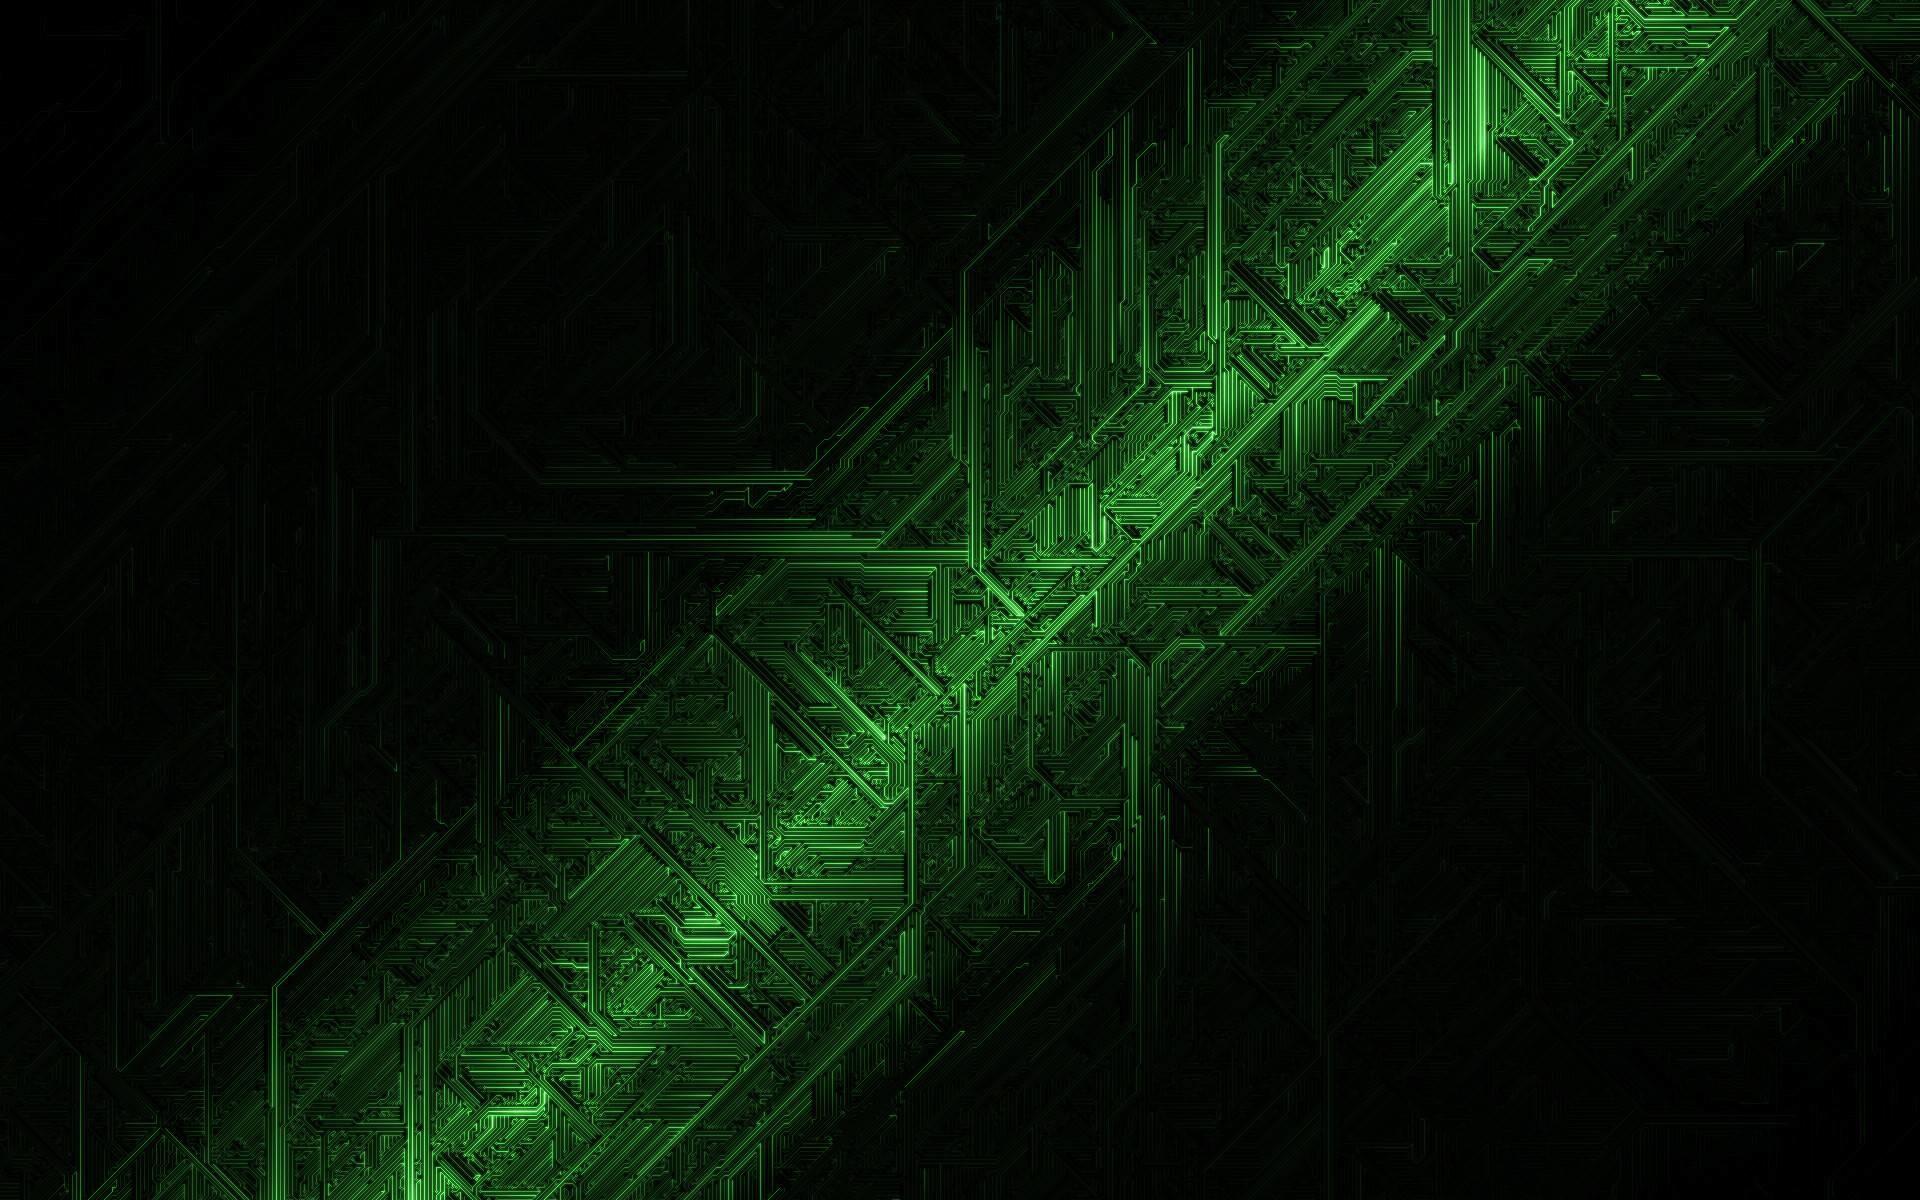 Black Green Abstract HD Wallpaper 1920×1080